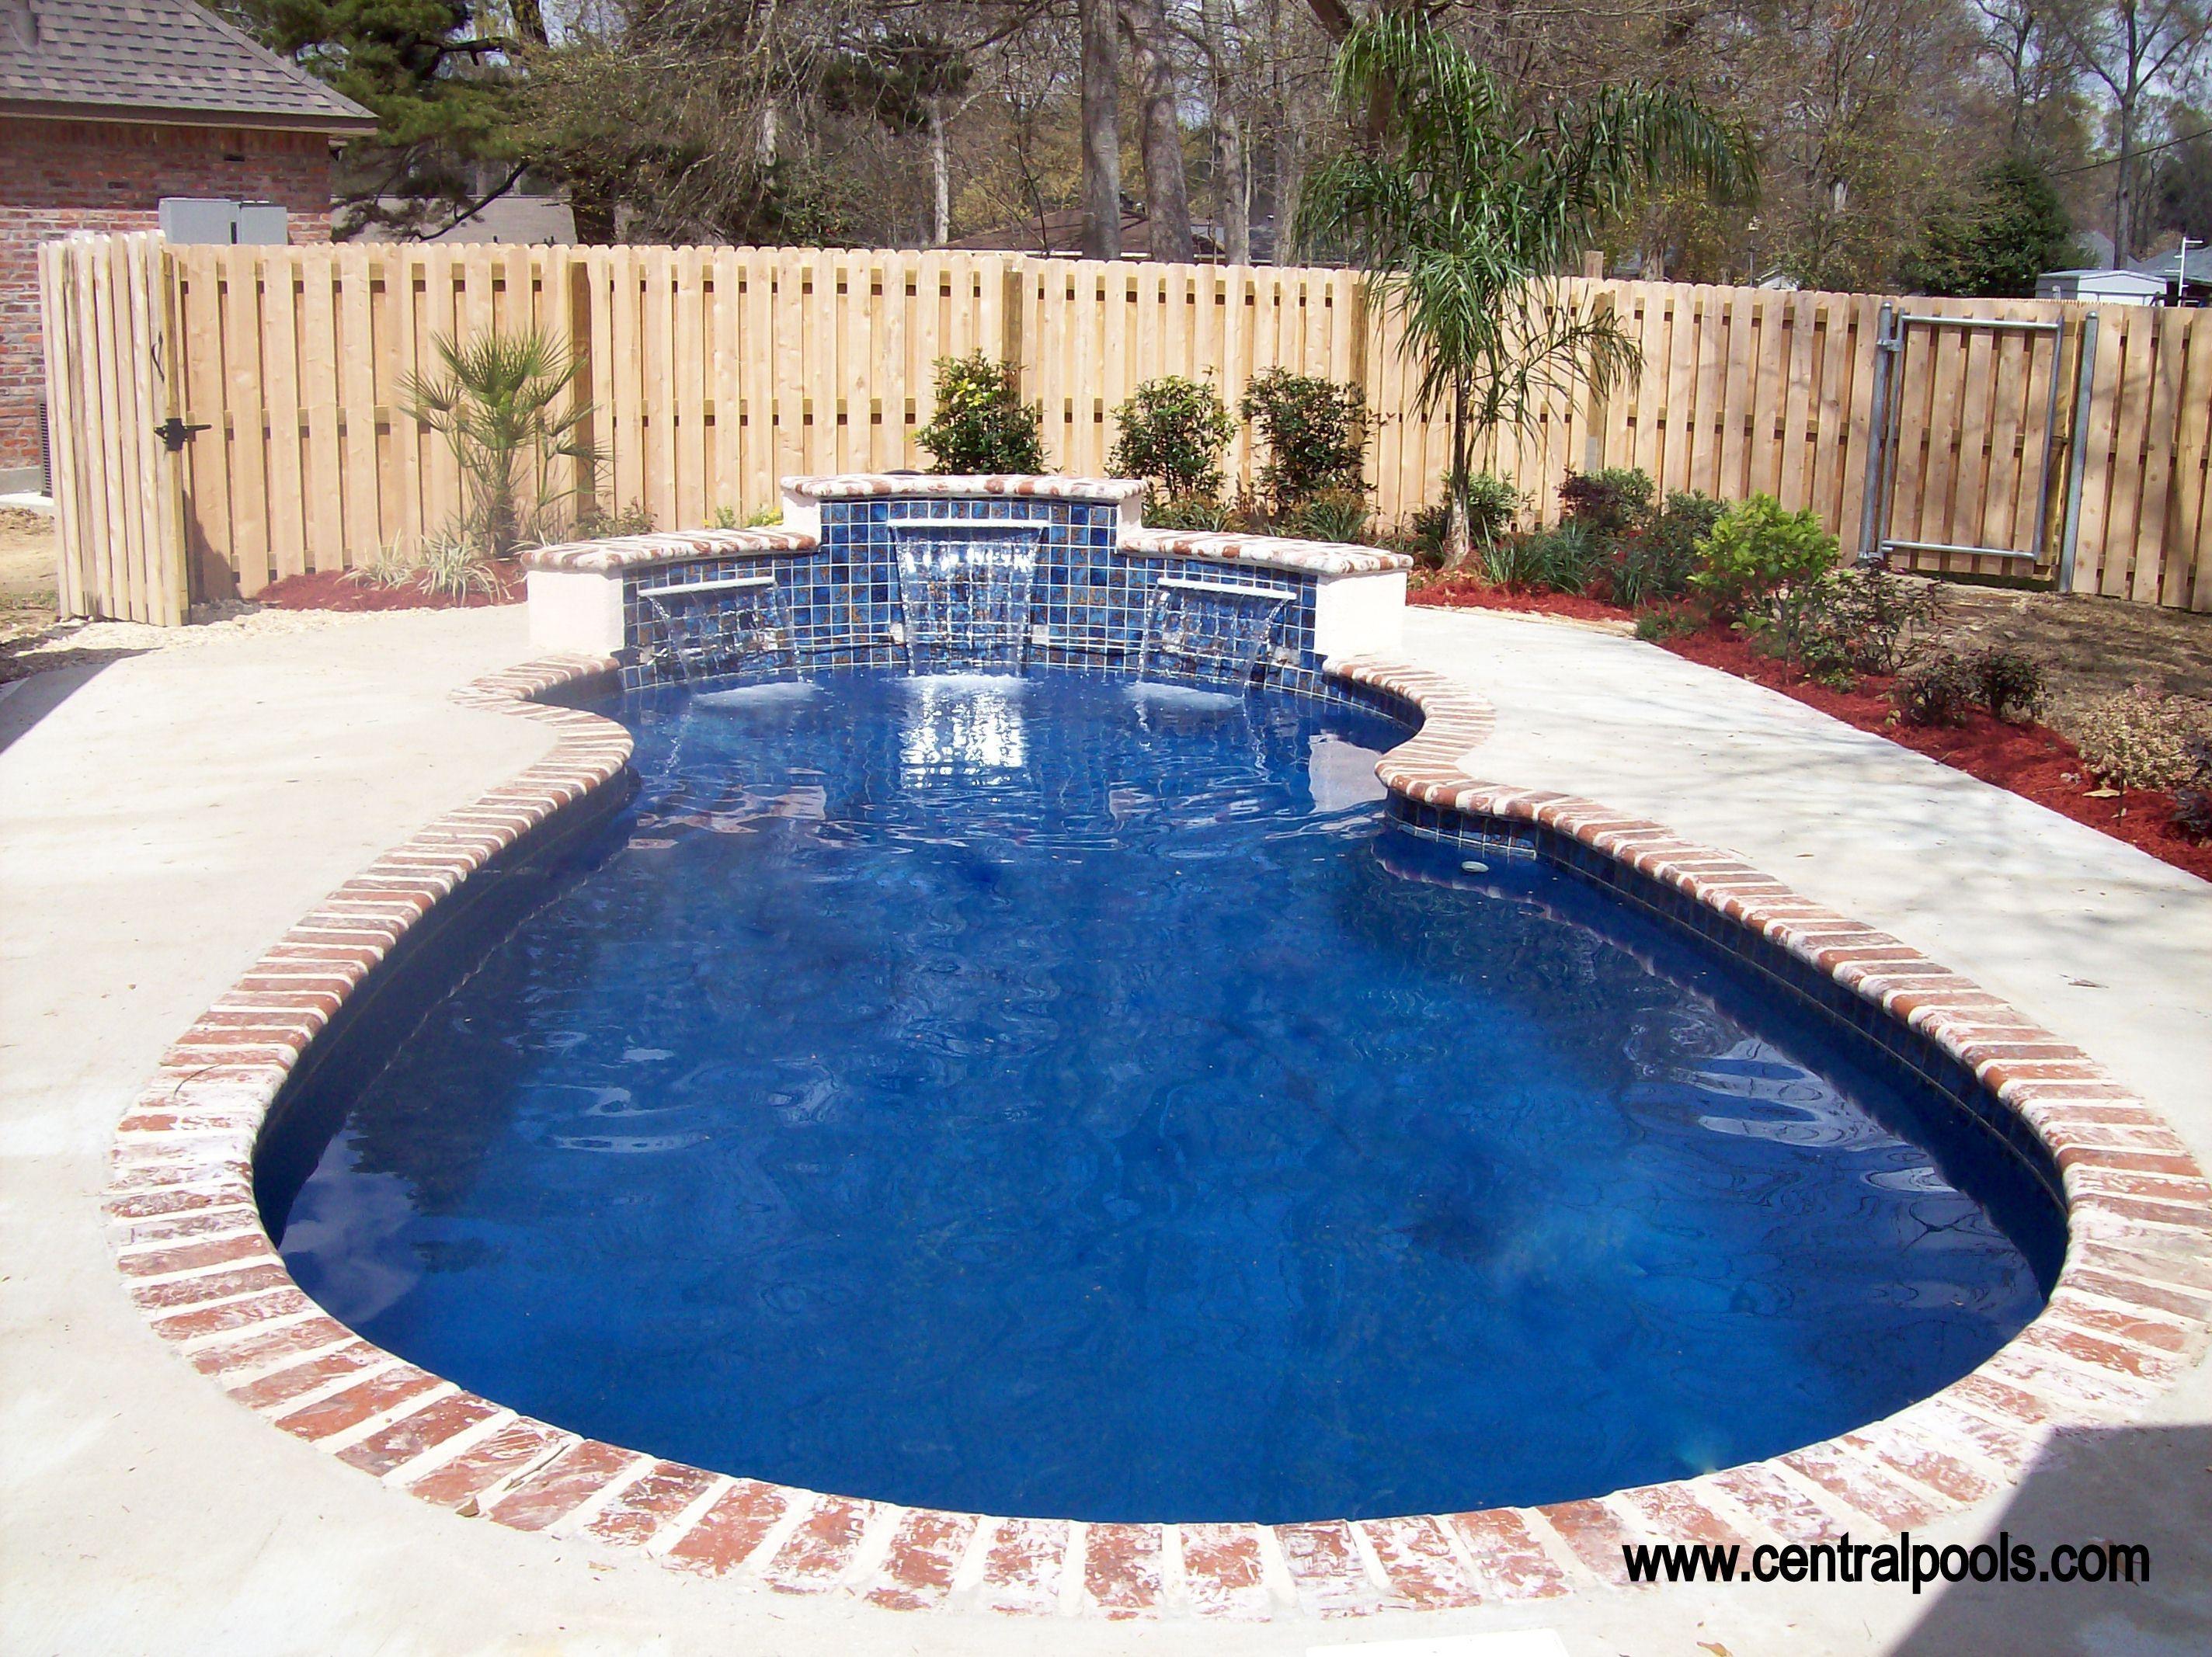 Central Pools Baton Rouge Fiberglass Pools Pool Fiberglass Pools Fiberglass Swimming Pools